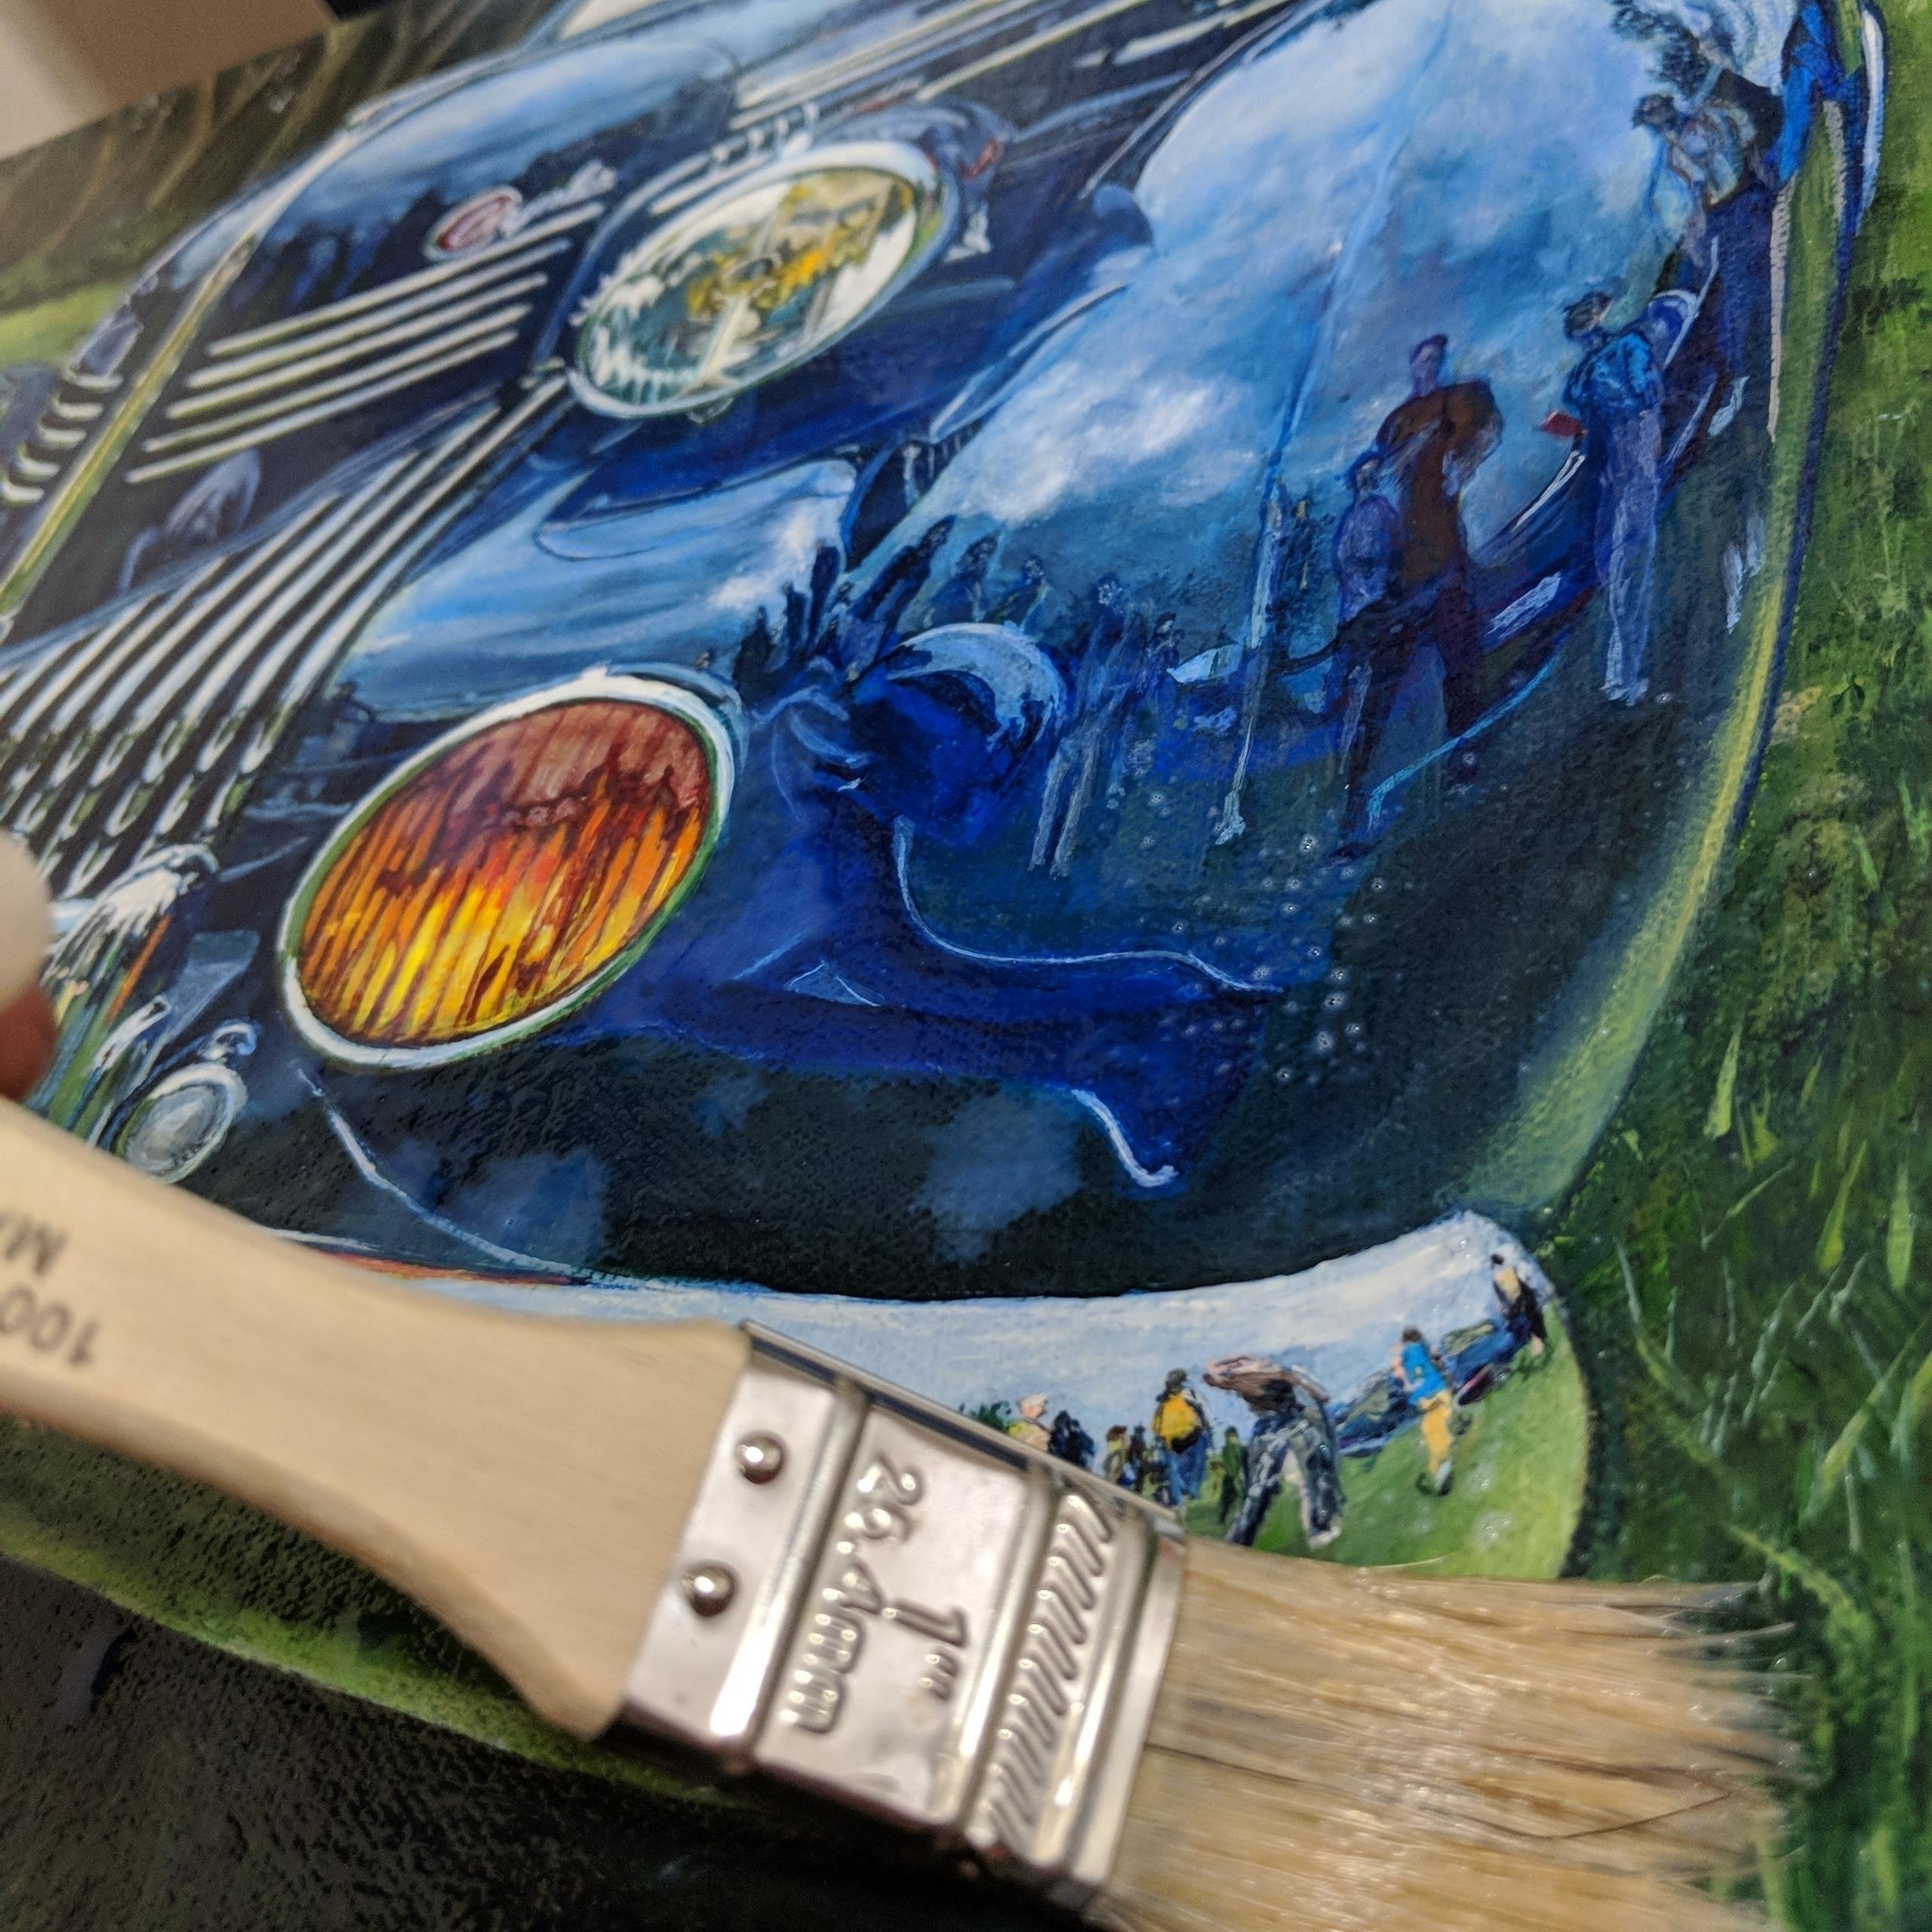 Varnishing 9 paintings upcoming - shanfannin | ello